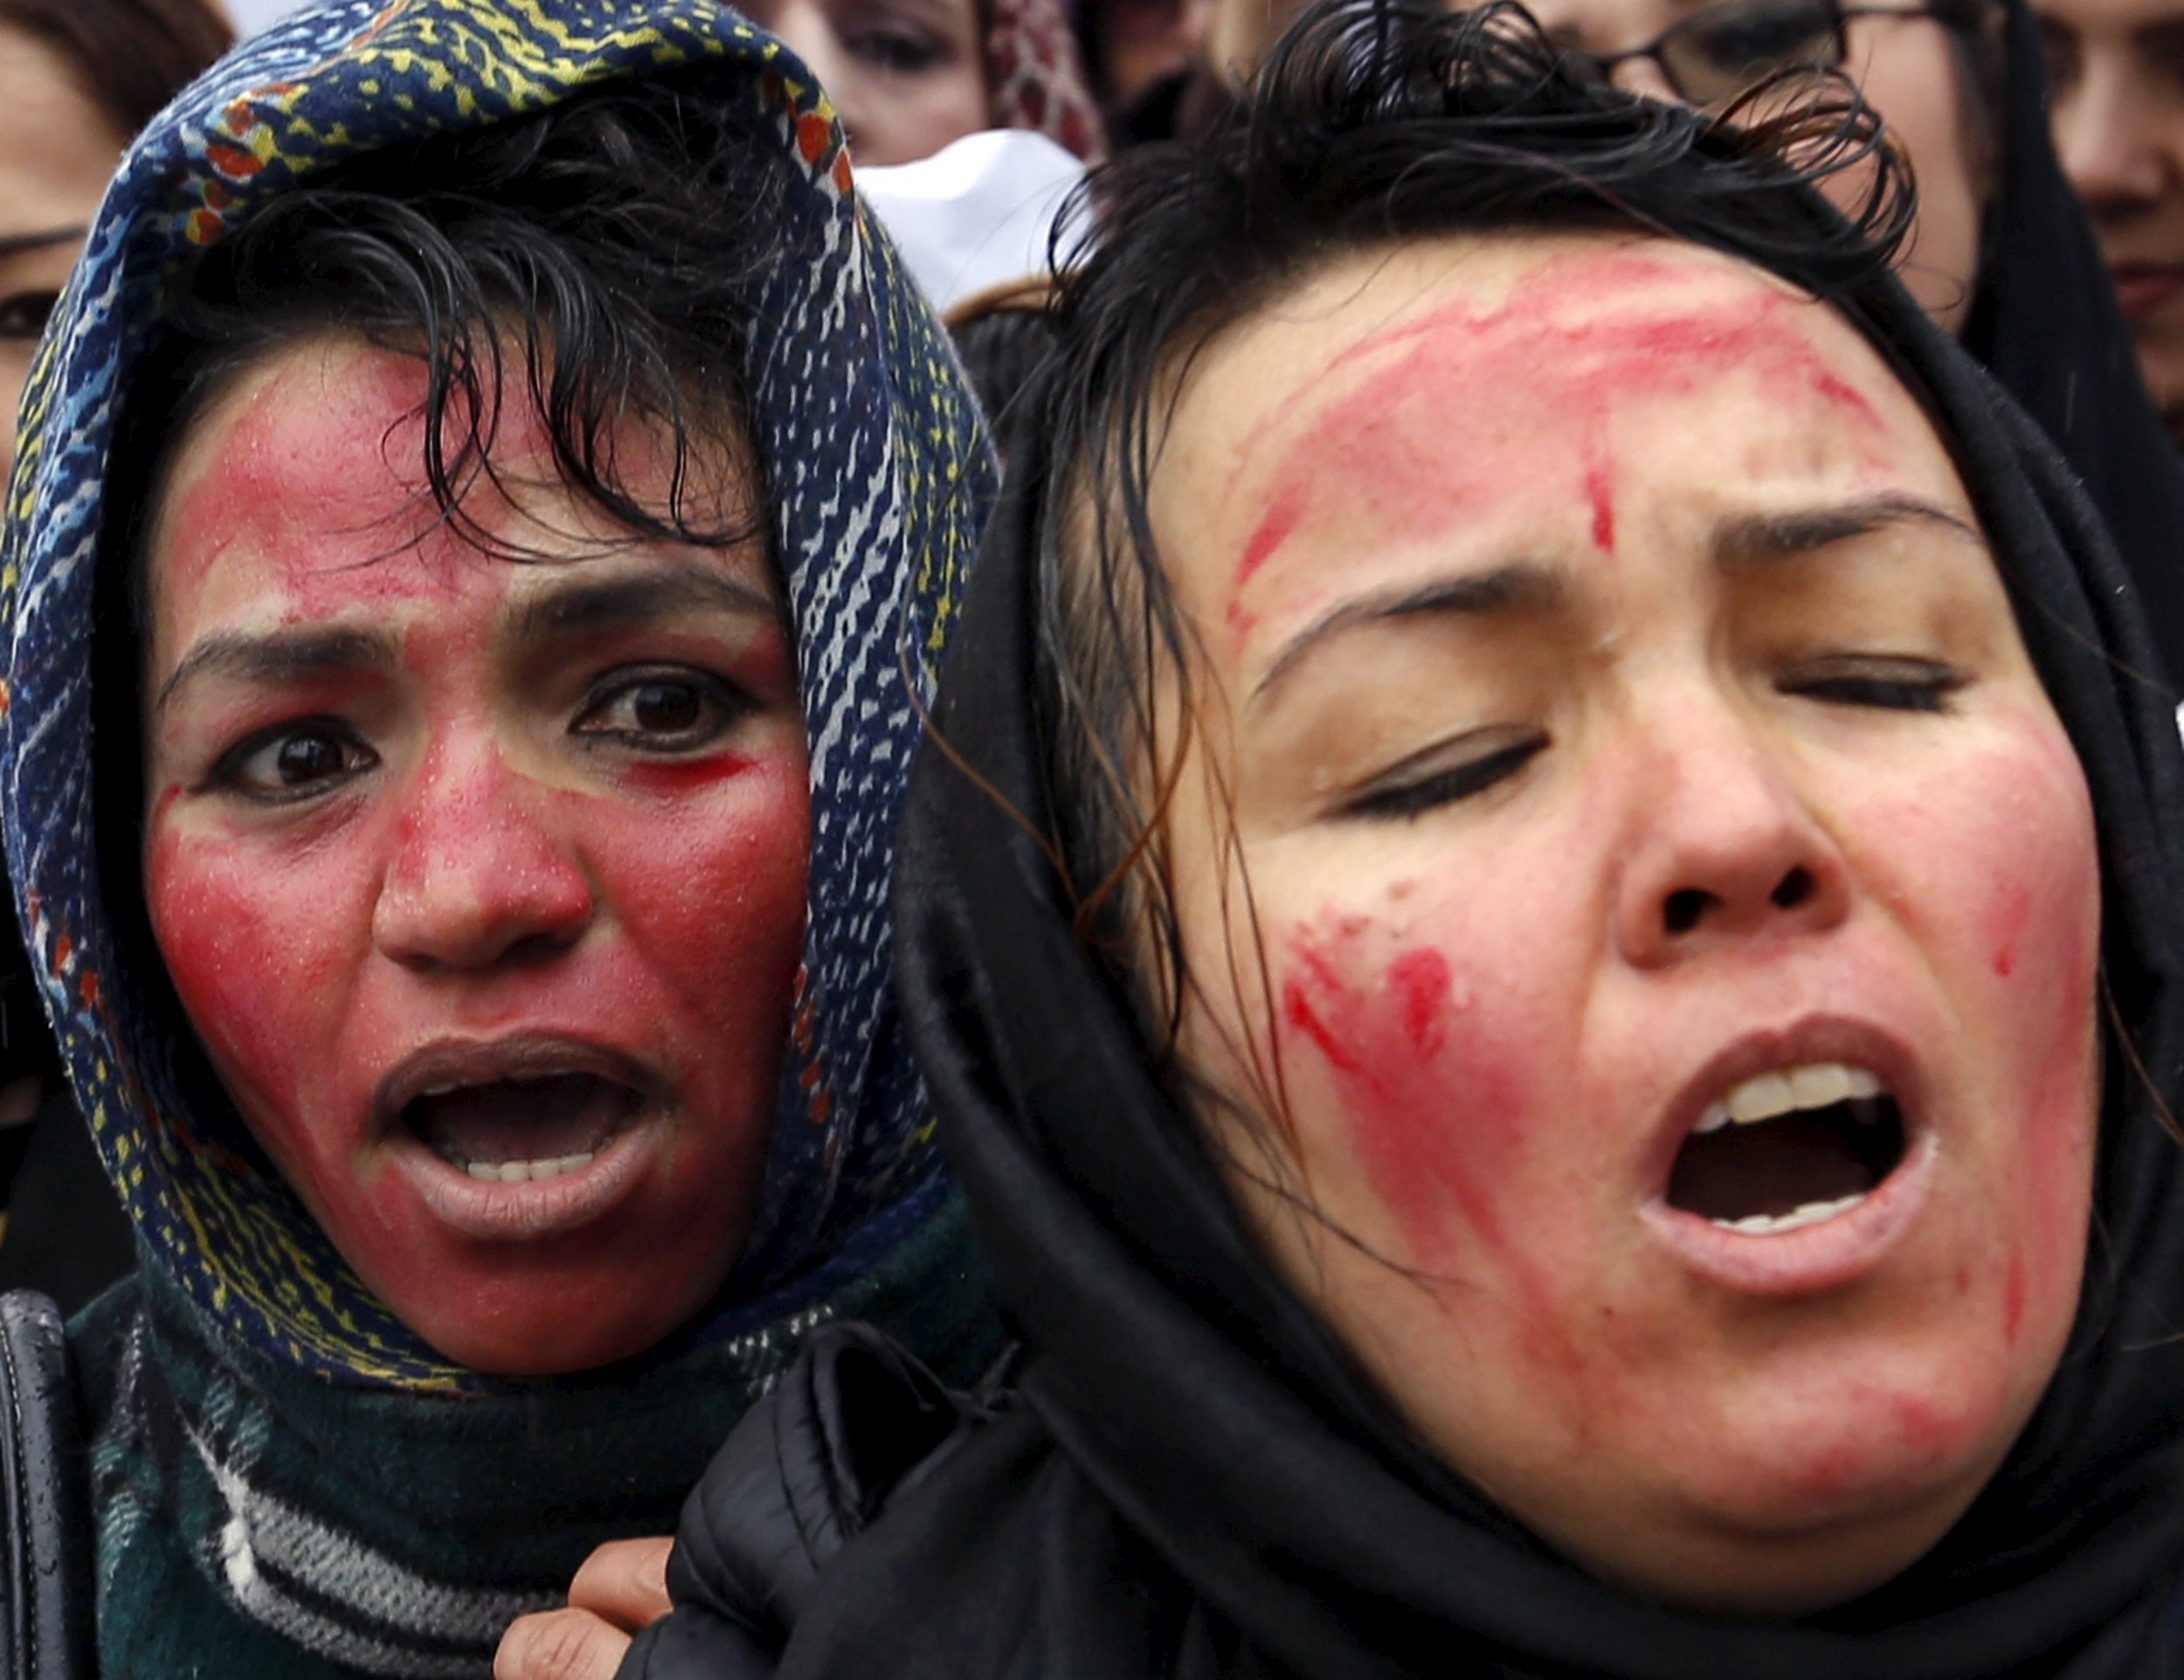 2015-03-24T113618Z_146193854_GF10000036567_RTRMADP_3_AFGHANISTAN-WOMAN